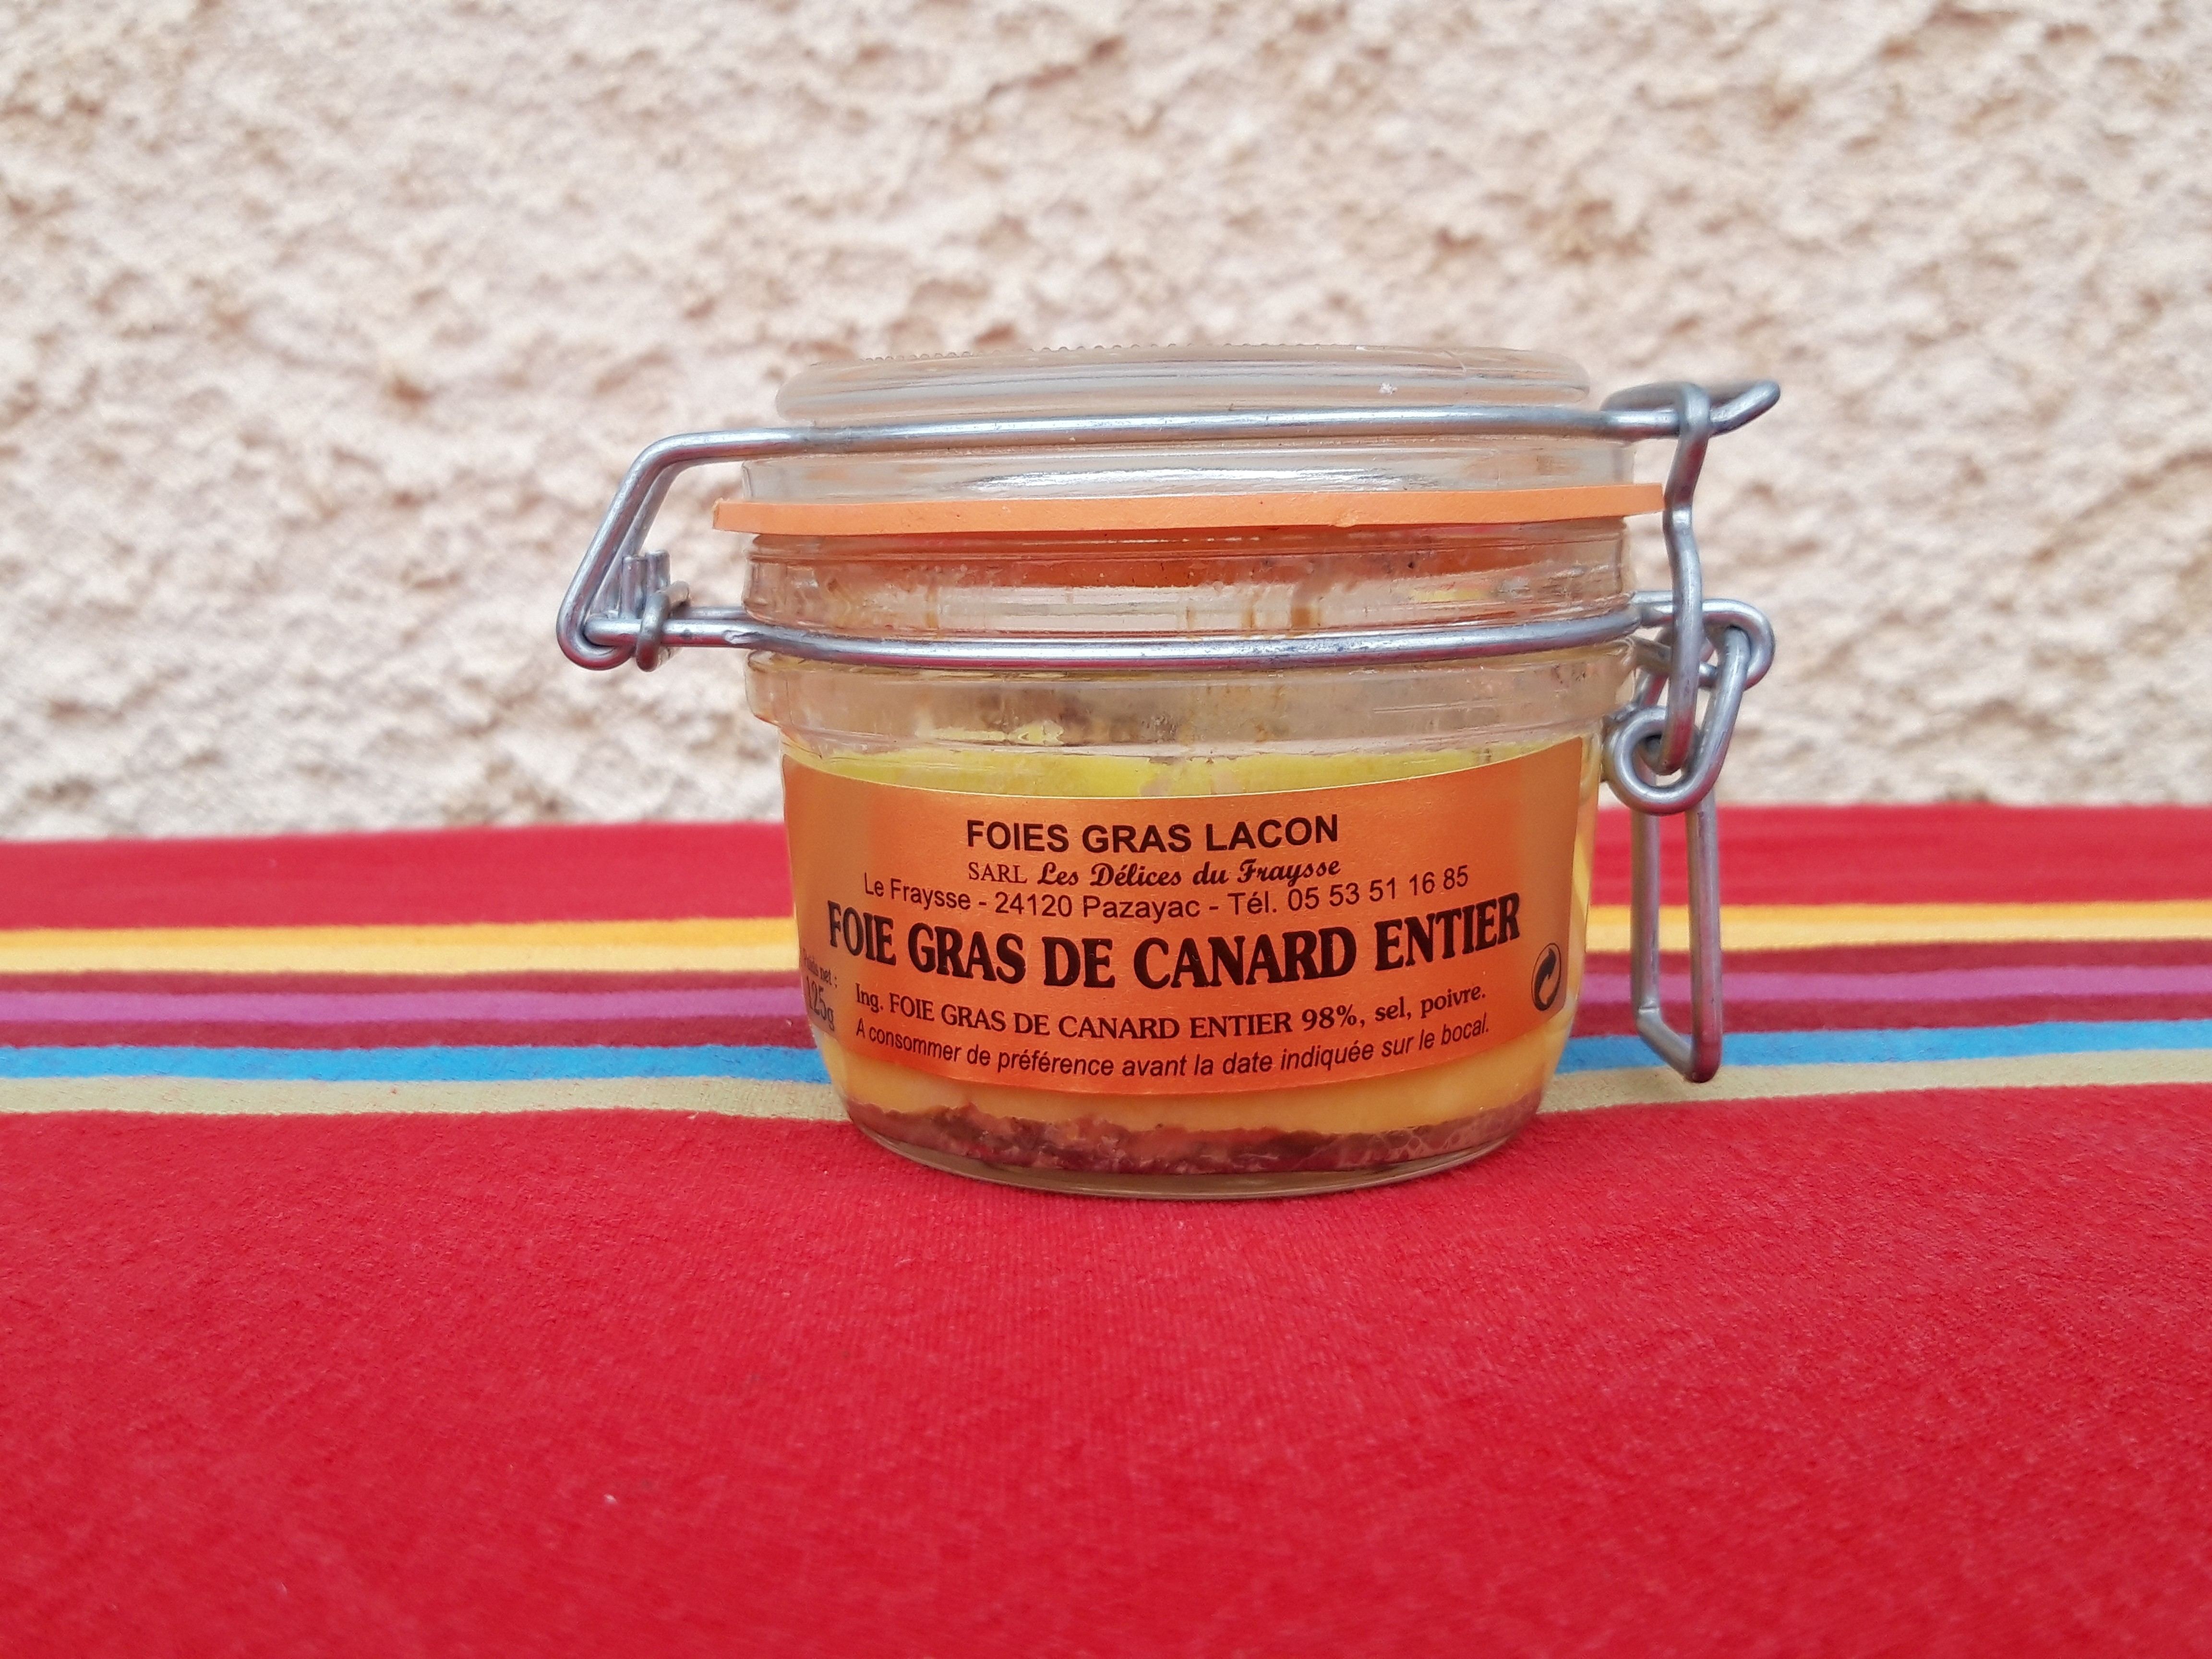 Foie gras entier 125g